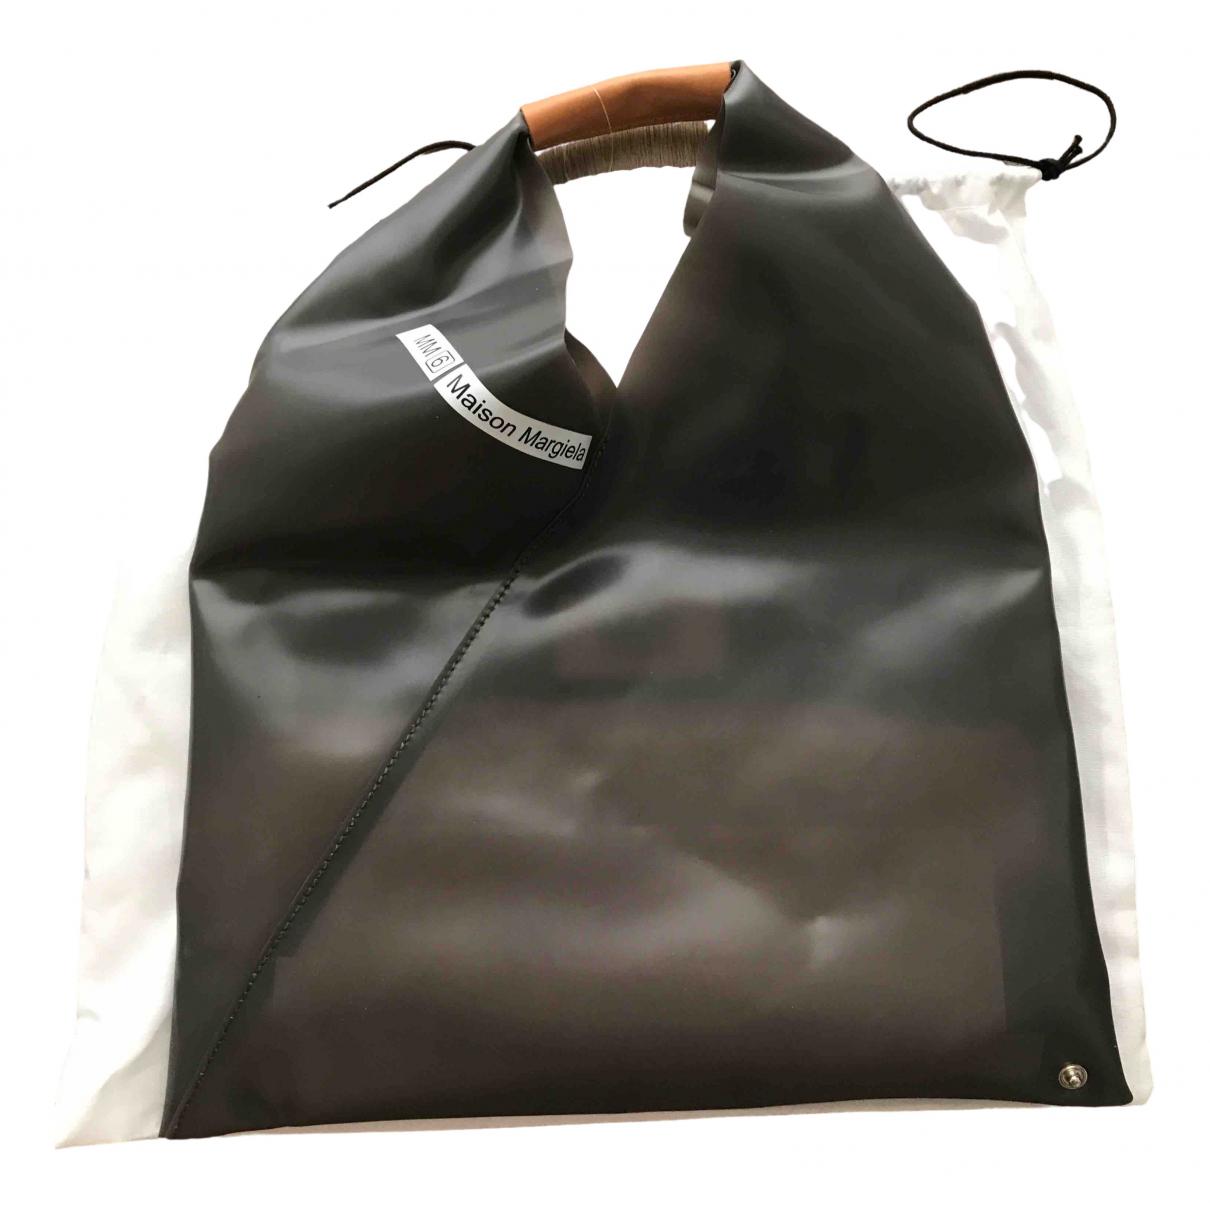 Mm6 \N Handtasche in  Anthrazit Kunststoff